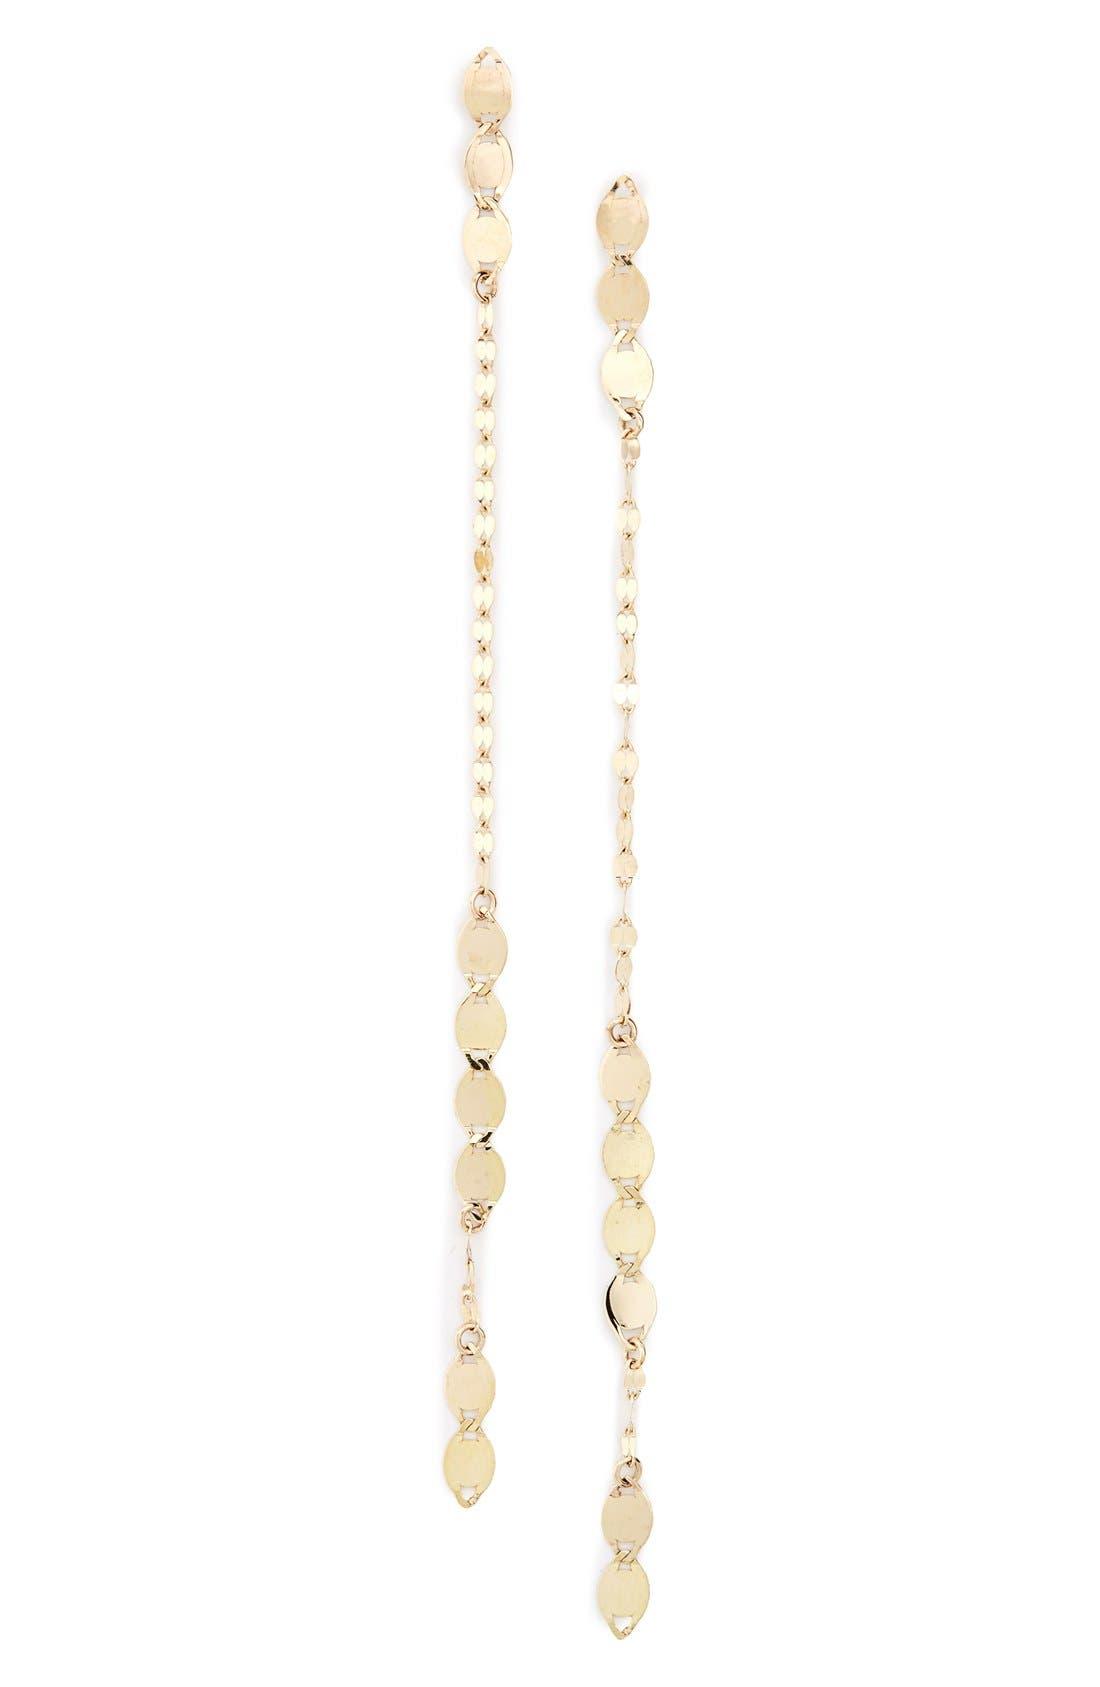 Linear Drop Earrings,                         Main,                         color, Yellow Gold